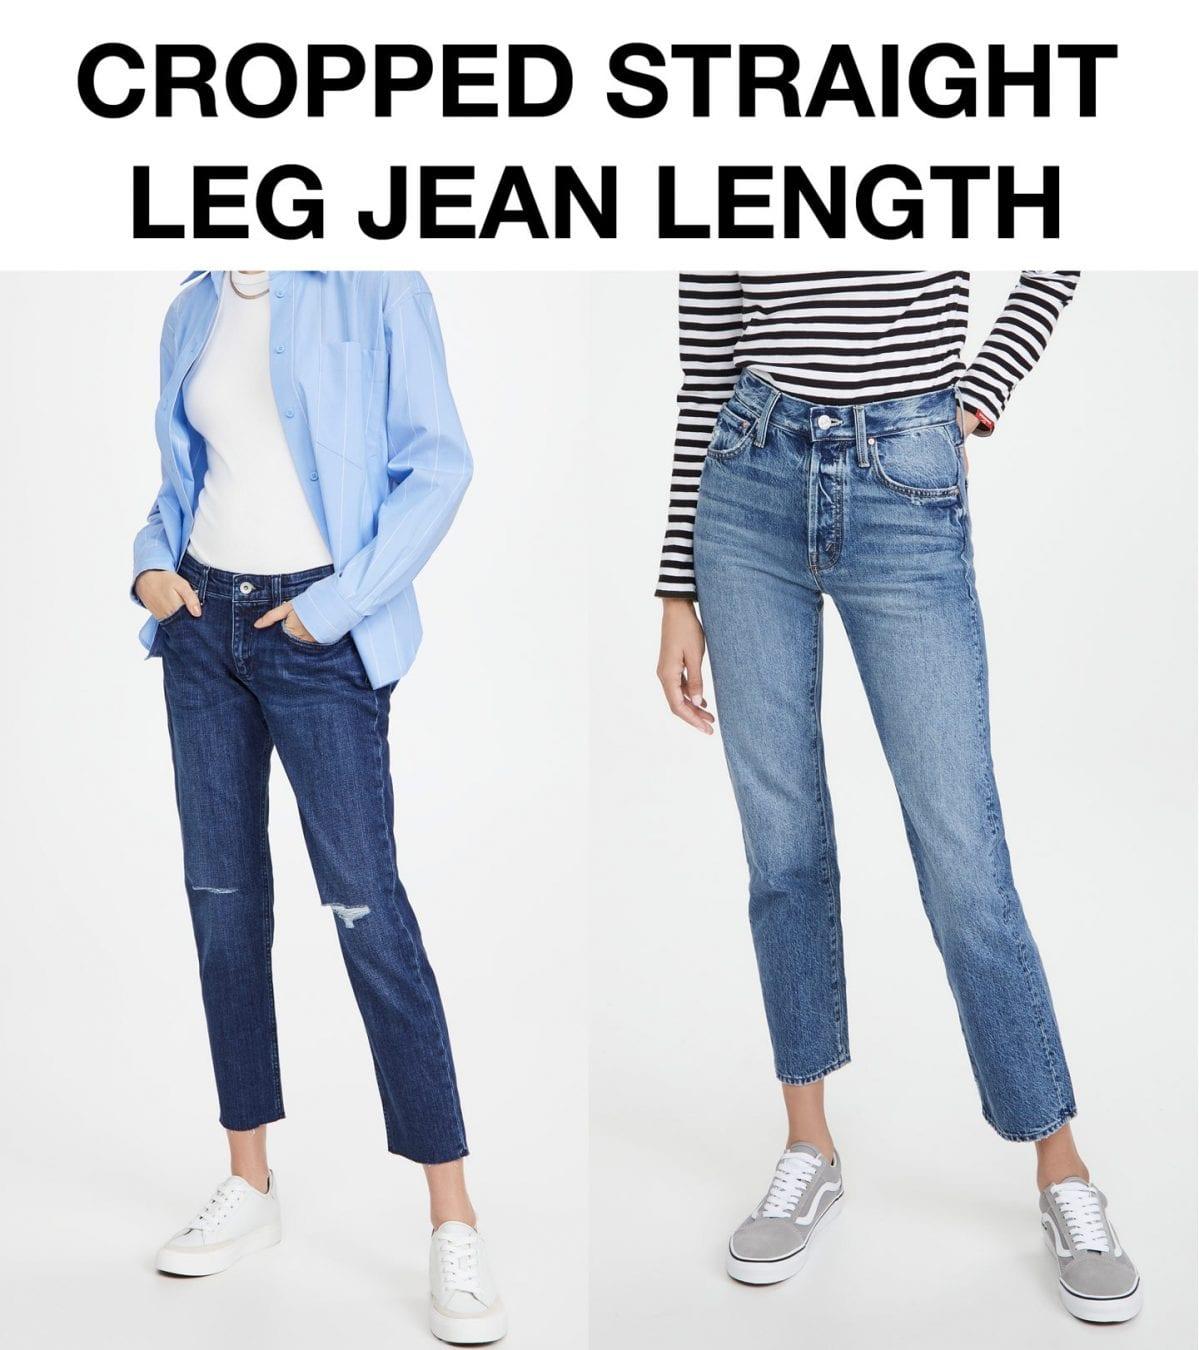 Cropped straight leg jean length for hemming.